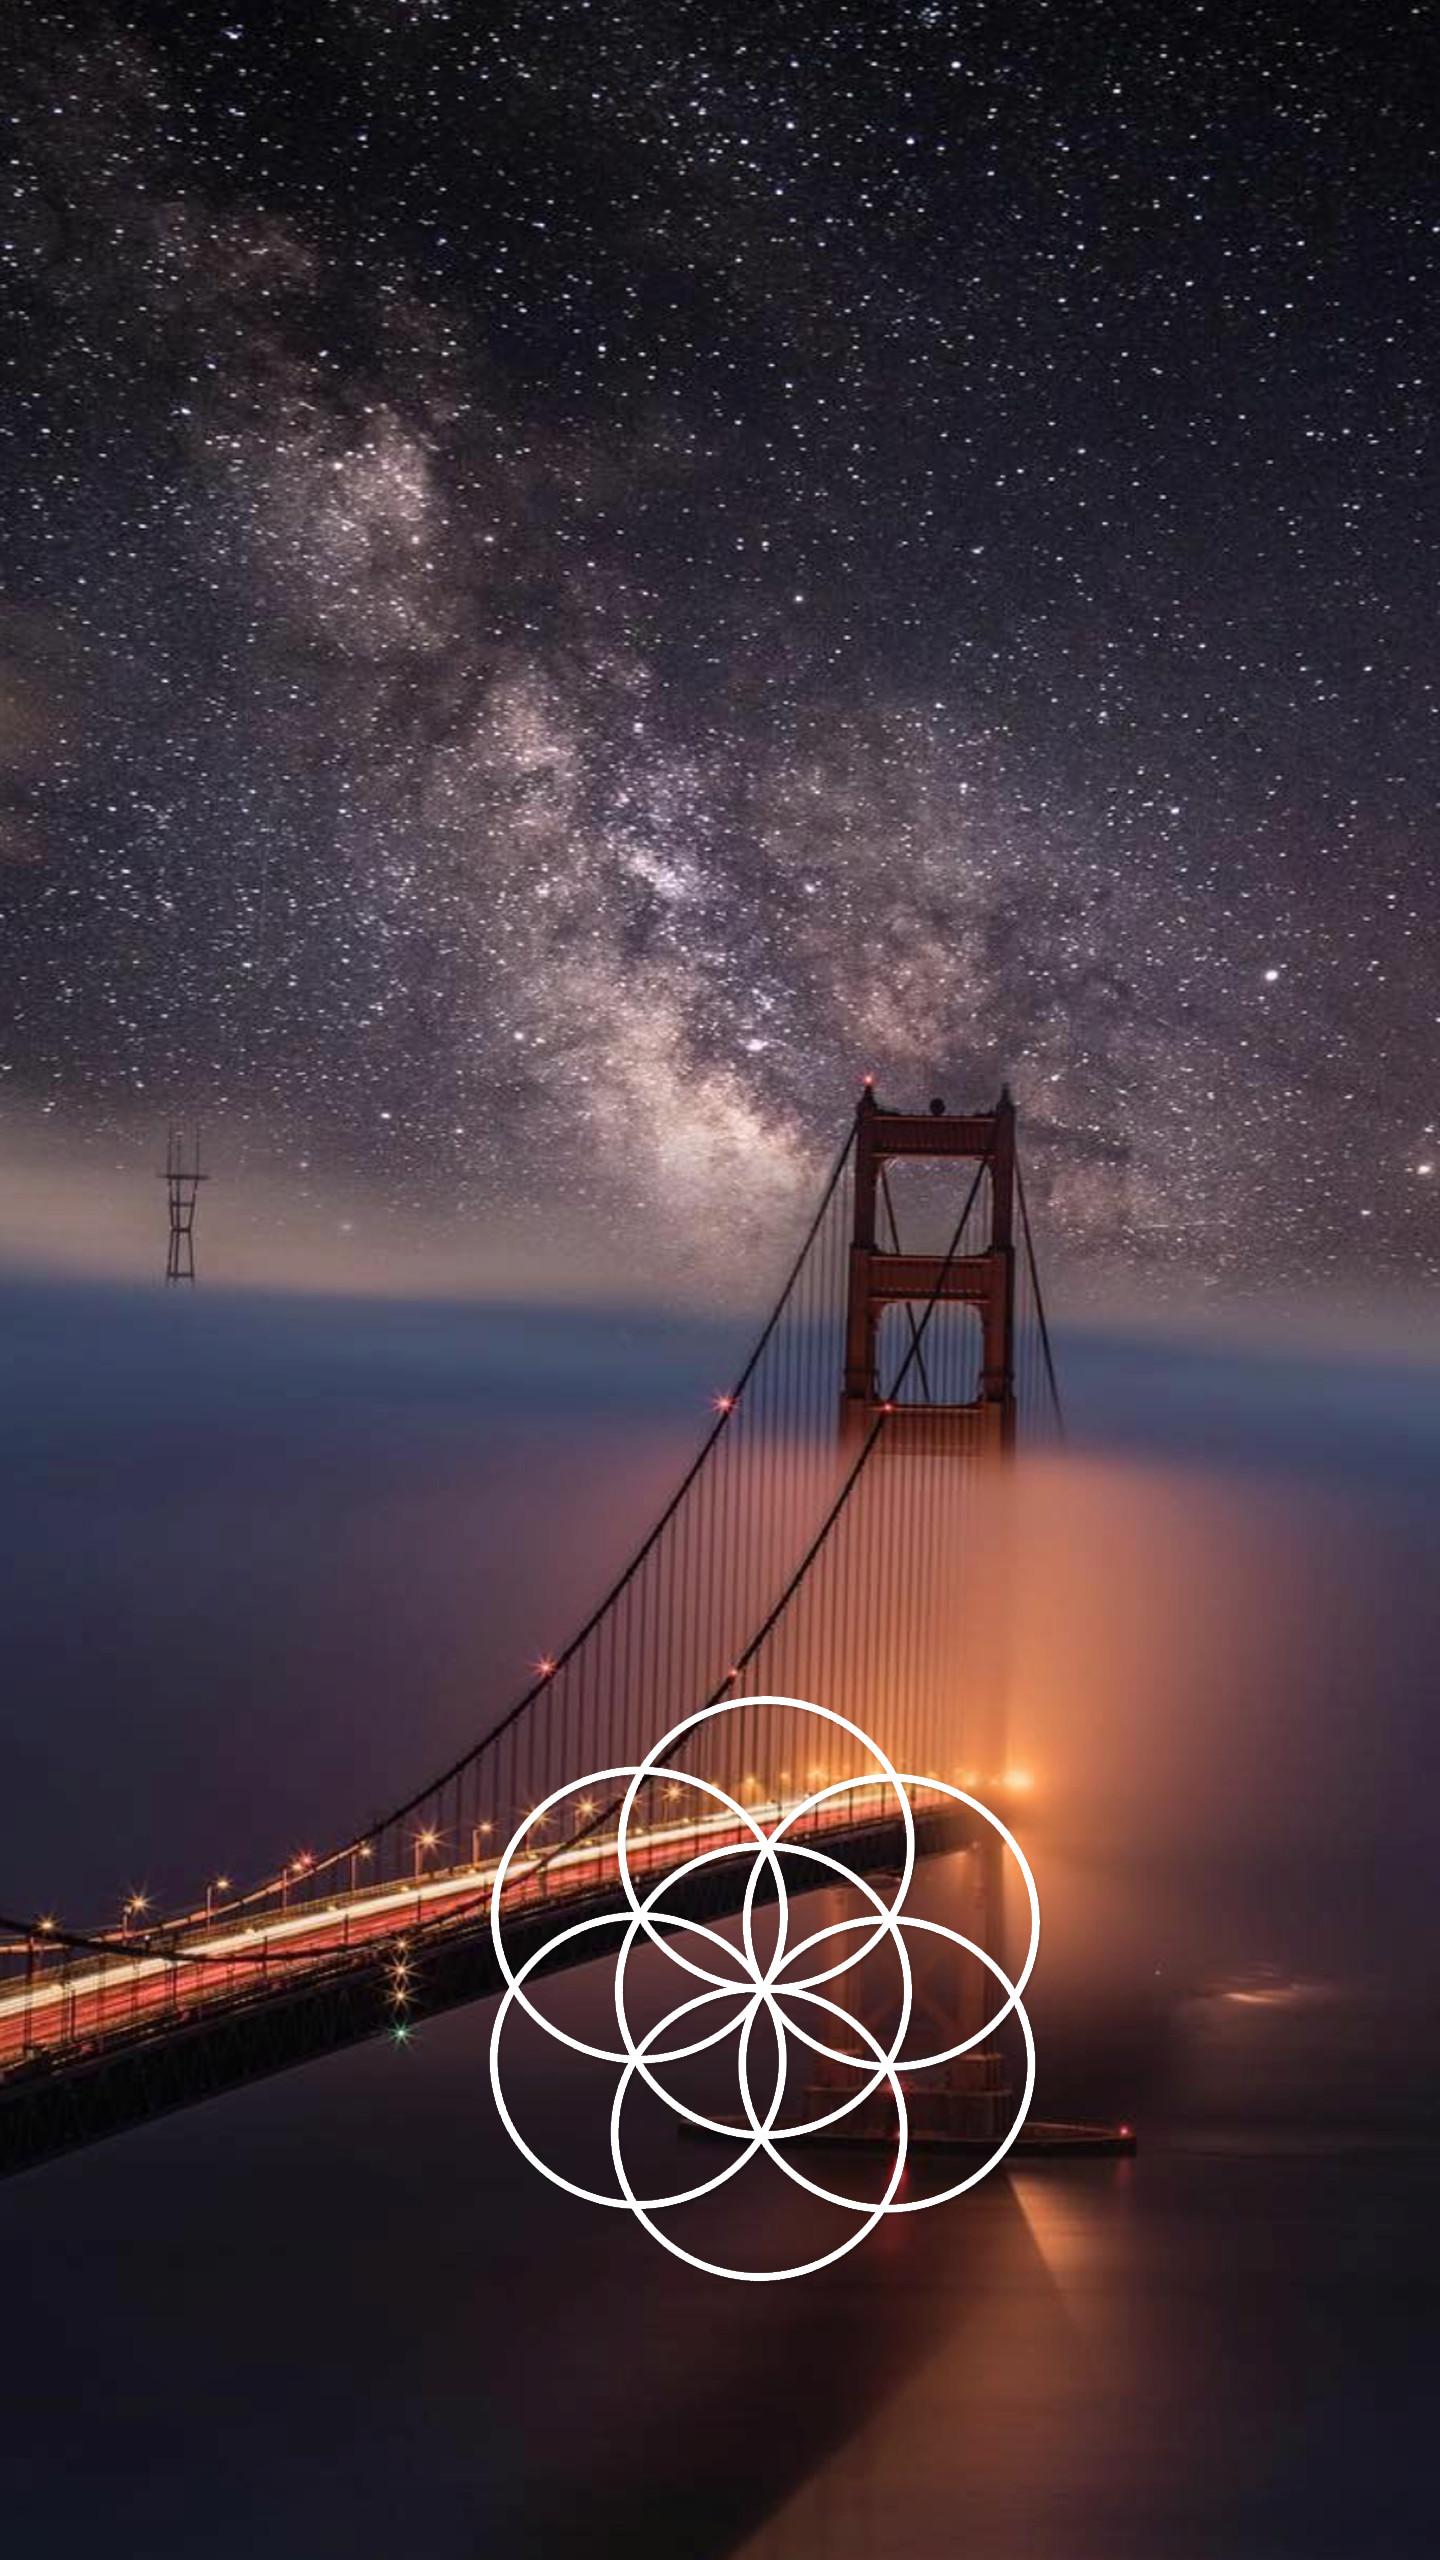 Sacred Geometry Galaxy S7 Wallpaper – image #807915